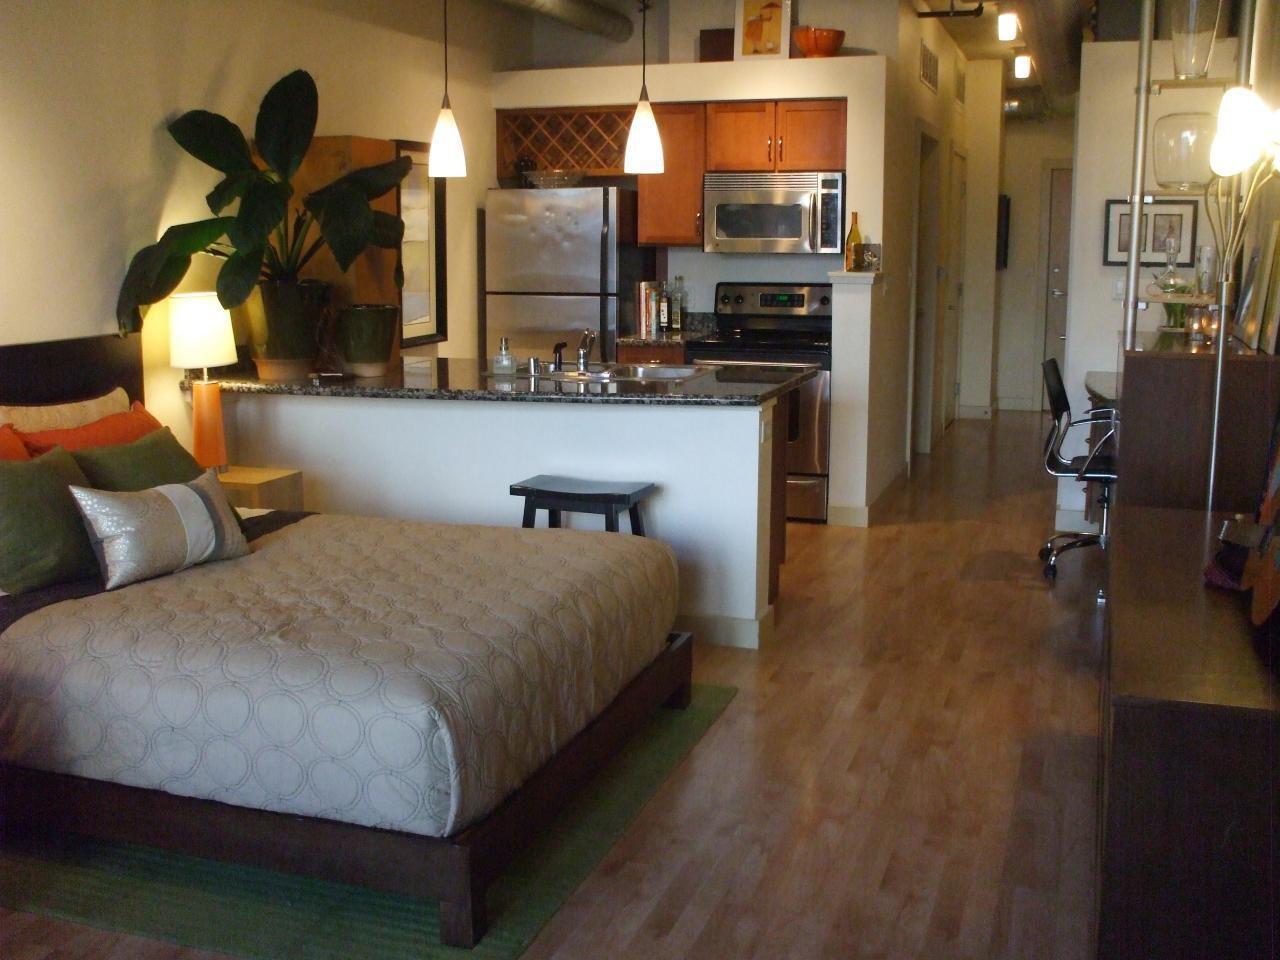 Studio Apartment Storage Ideas - http://duwet.xyz/070539/studio ...